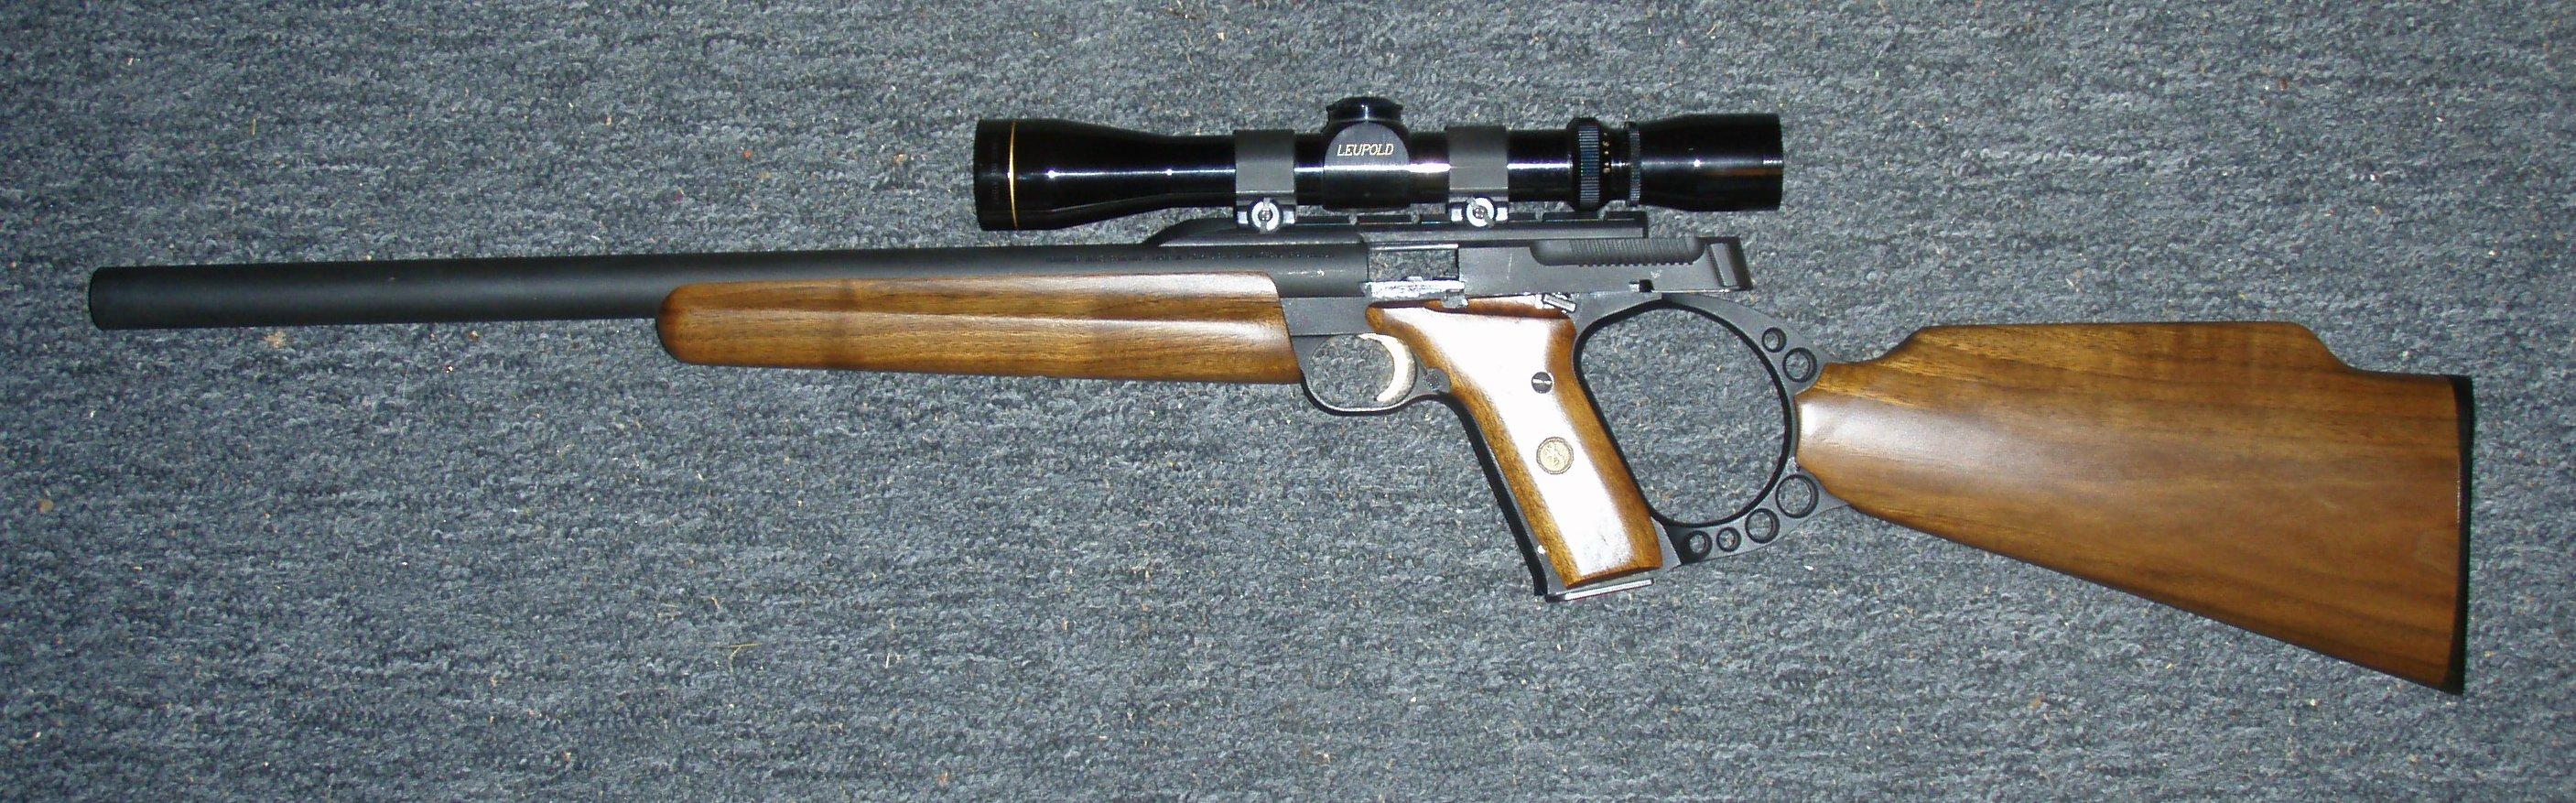 Description Buckmark Rifle 22 Target 1.jpg